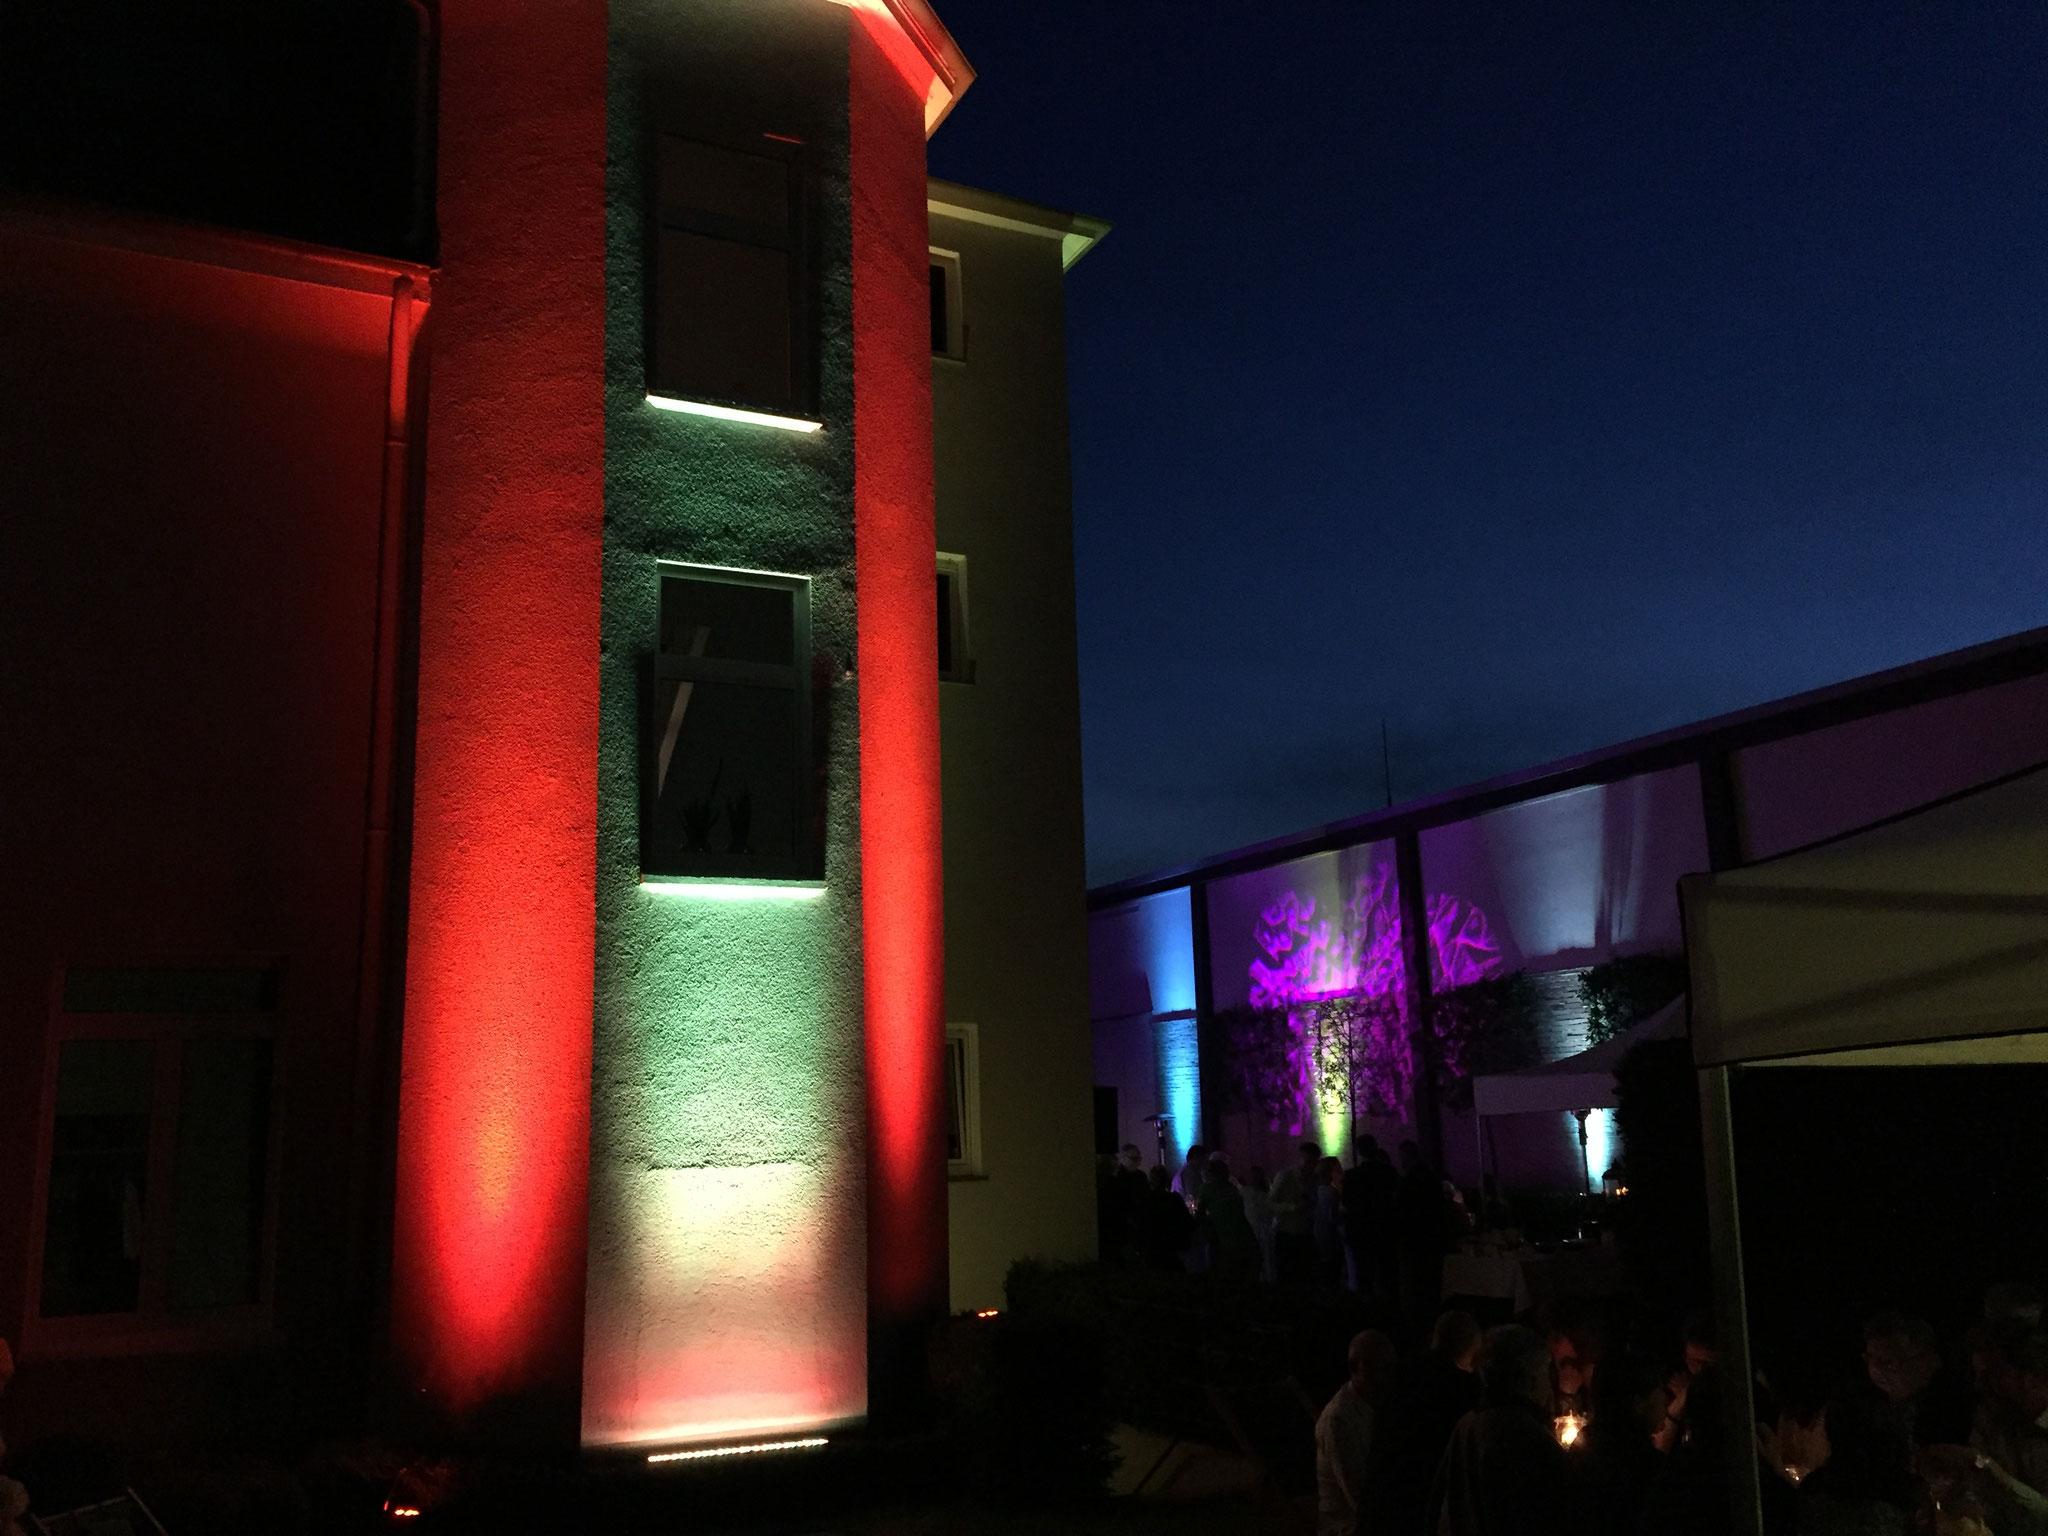 Gebäudebeleuchtung mit LED Spots